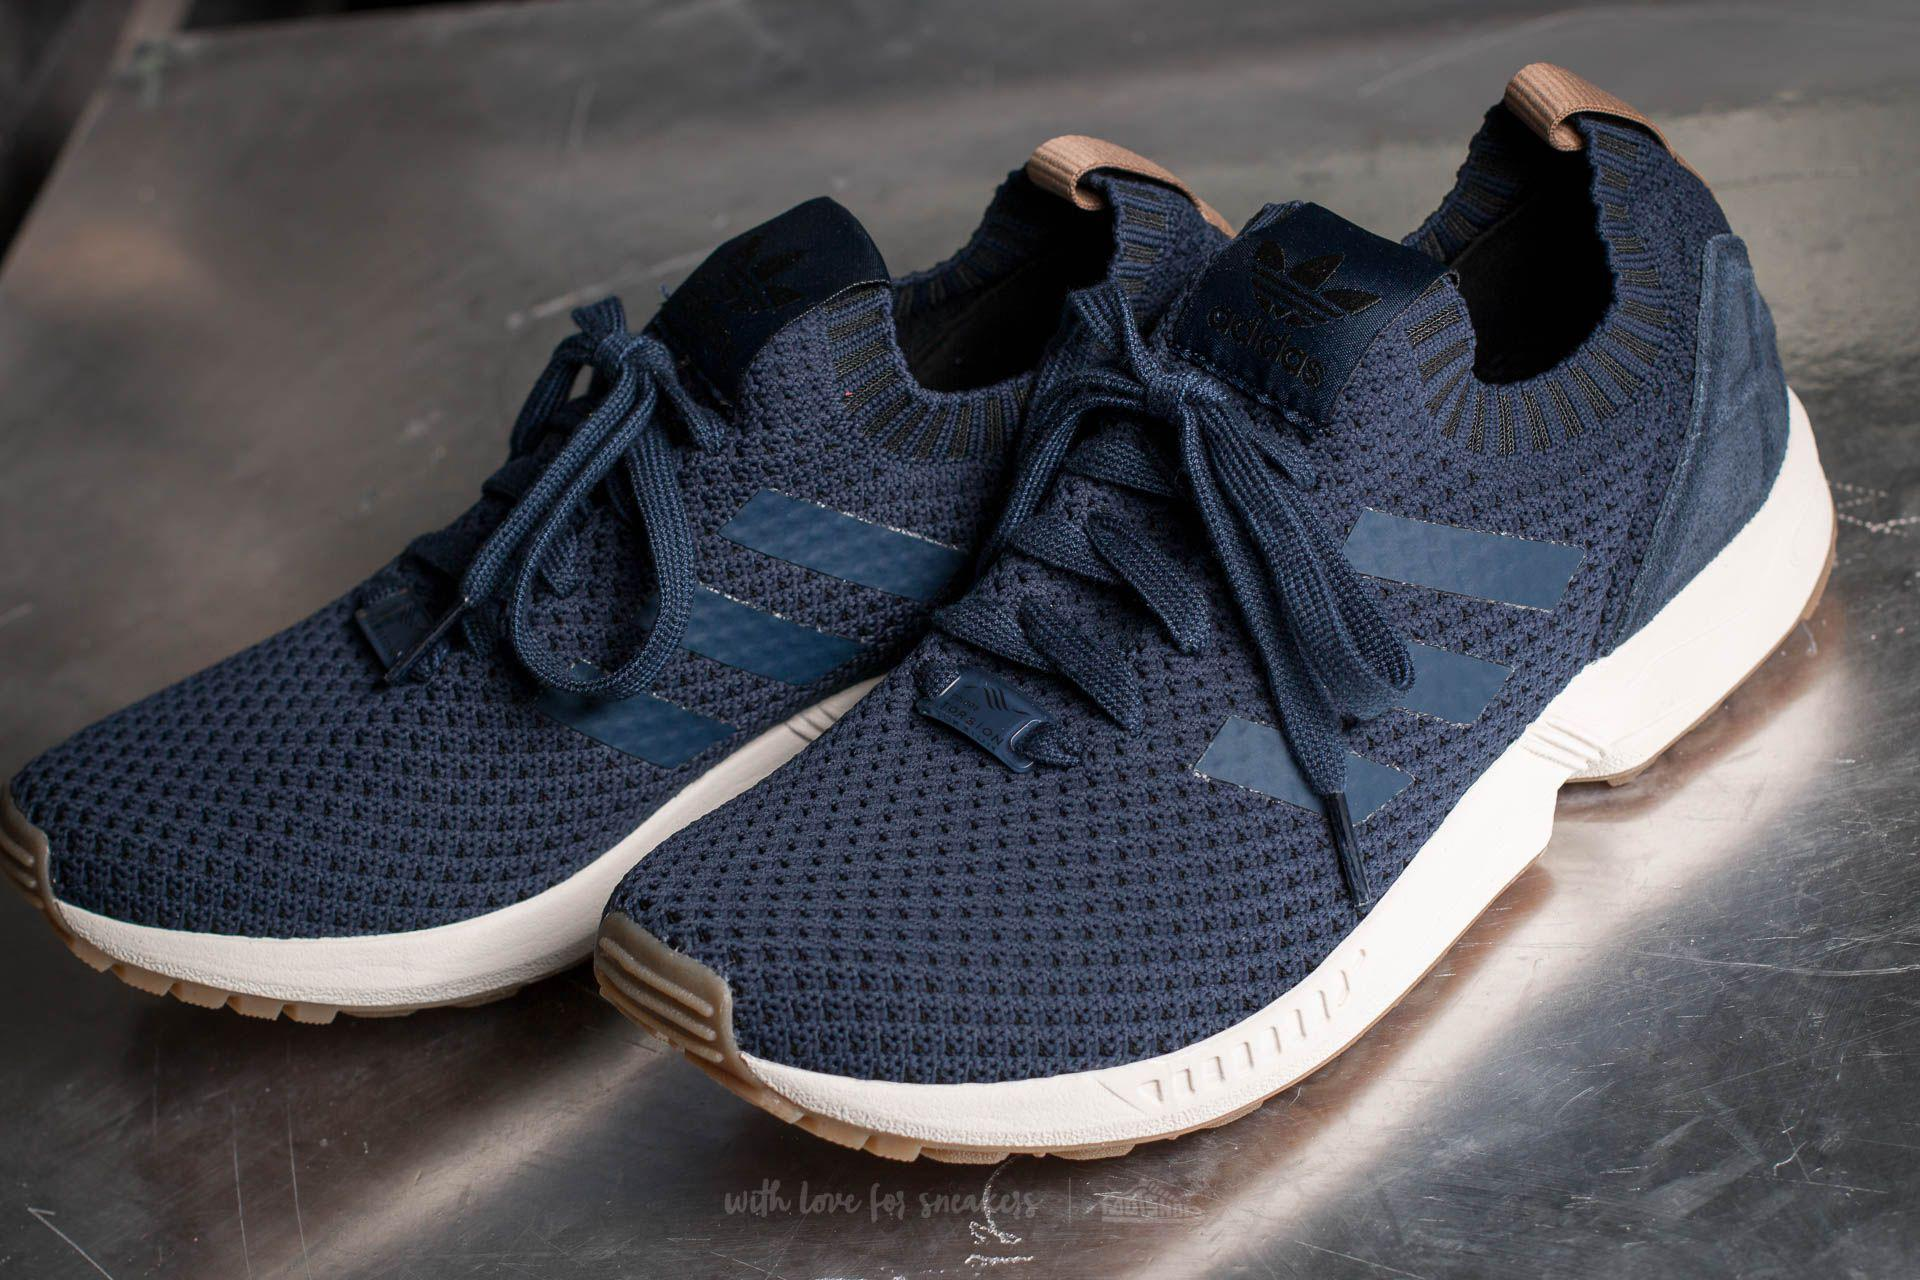 e435ad9b1dc7 Lyst - adidas Originals Adidas Zx Flux Primeknit Collegiate Navy ...